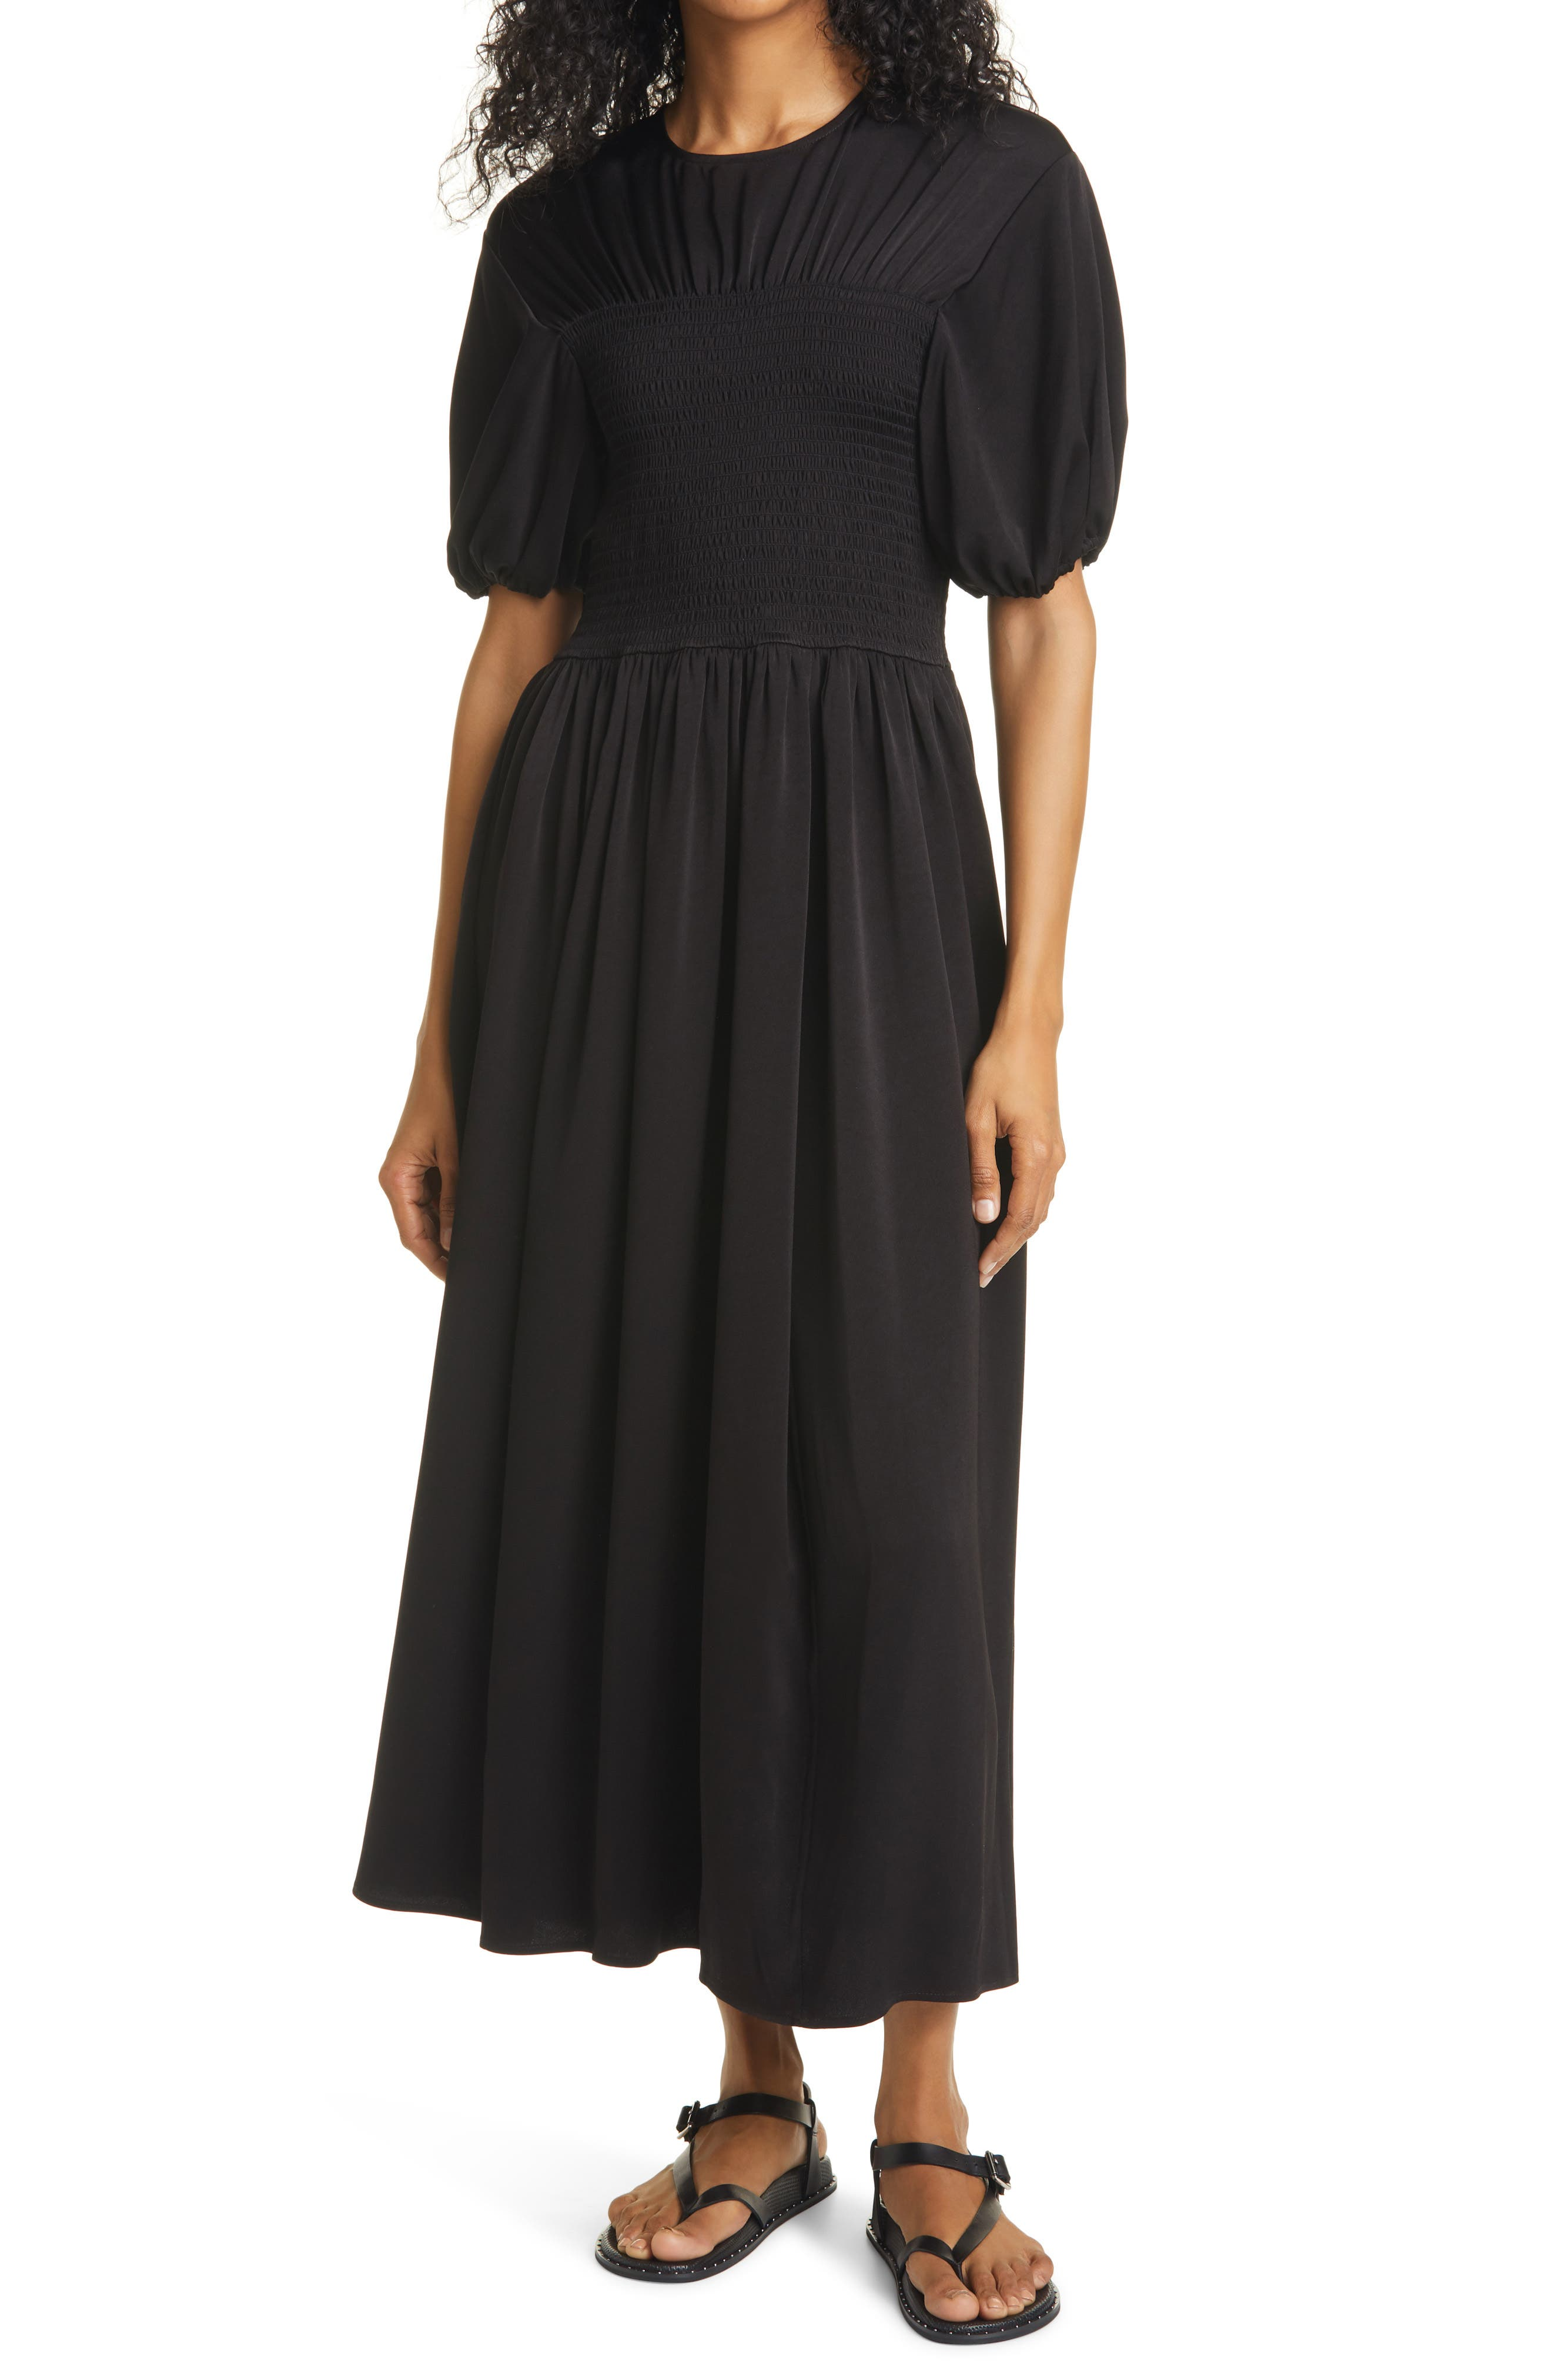 Smocked Bodice Puff Sleeve Maxi Dress